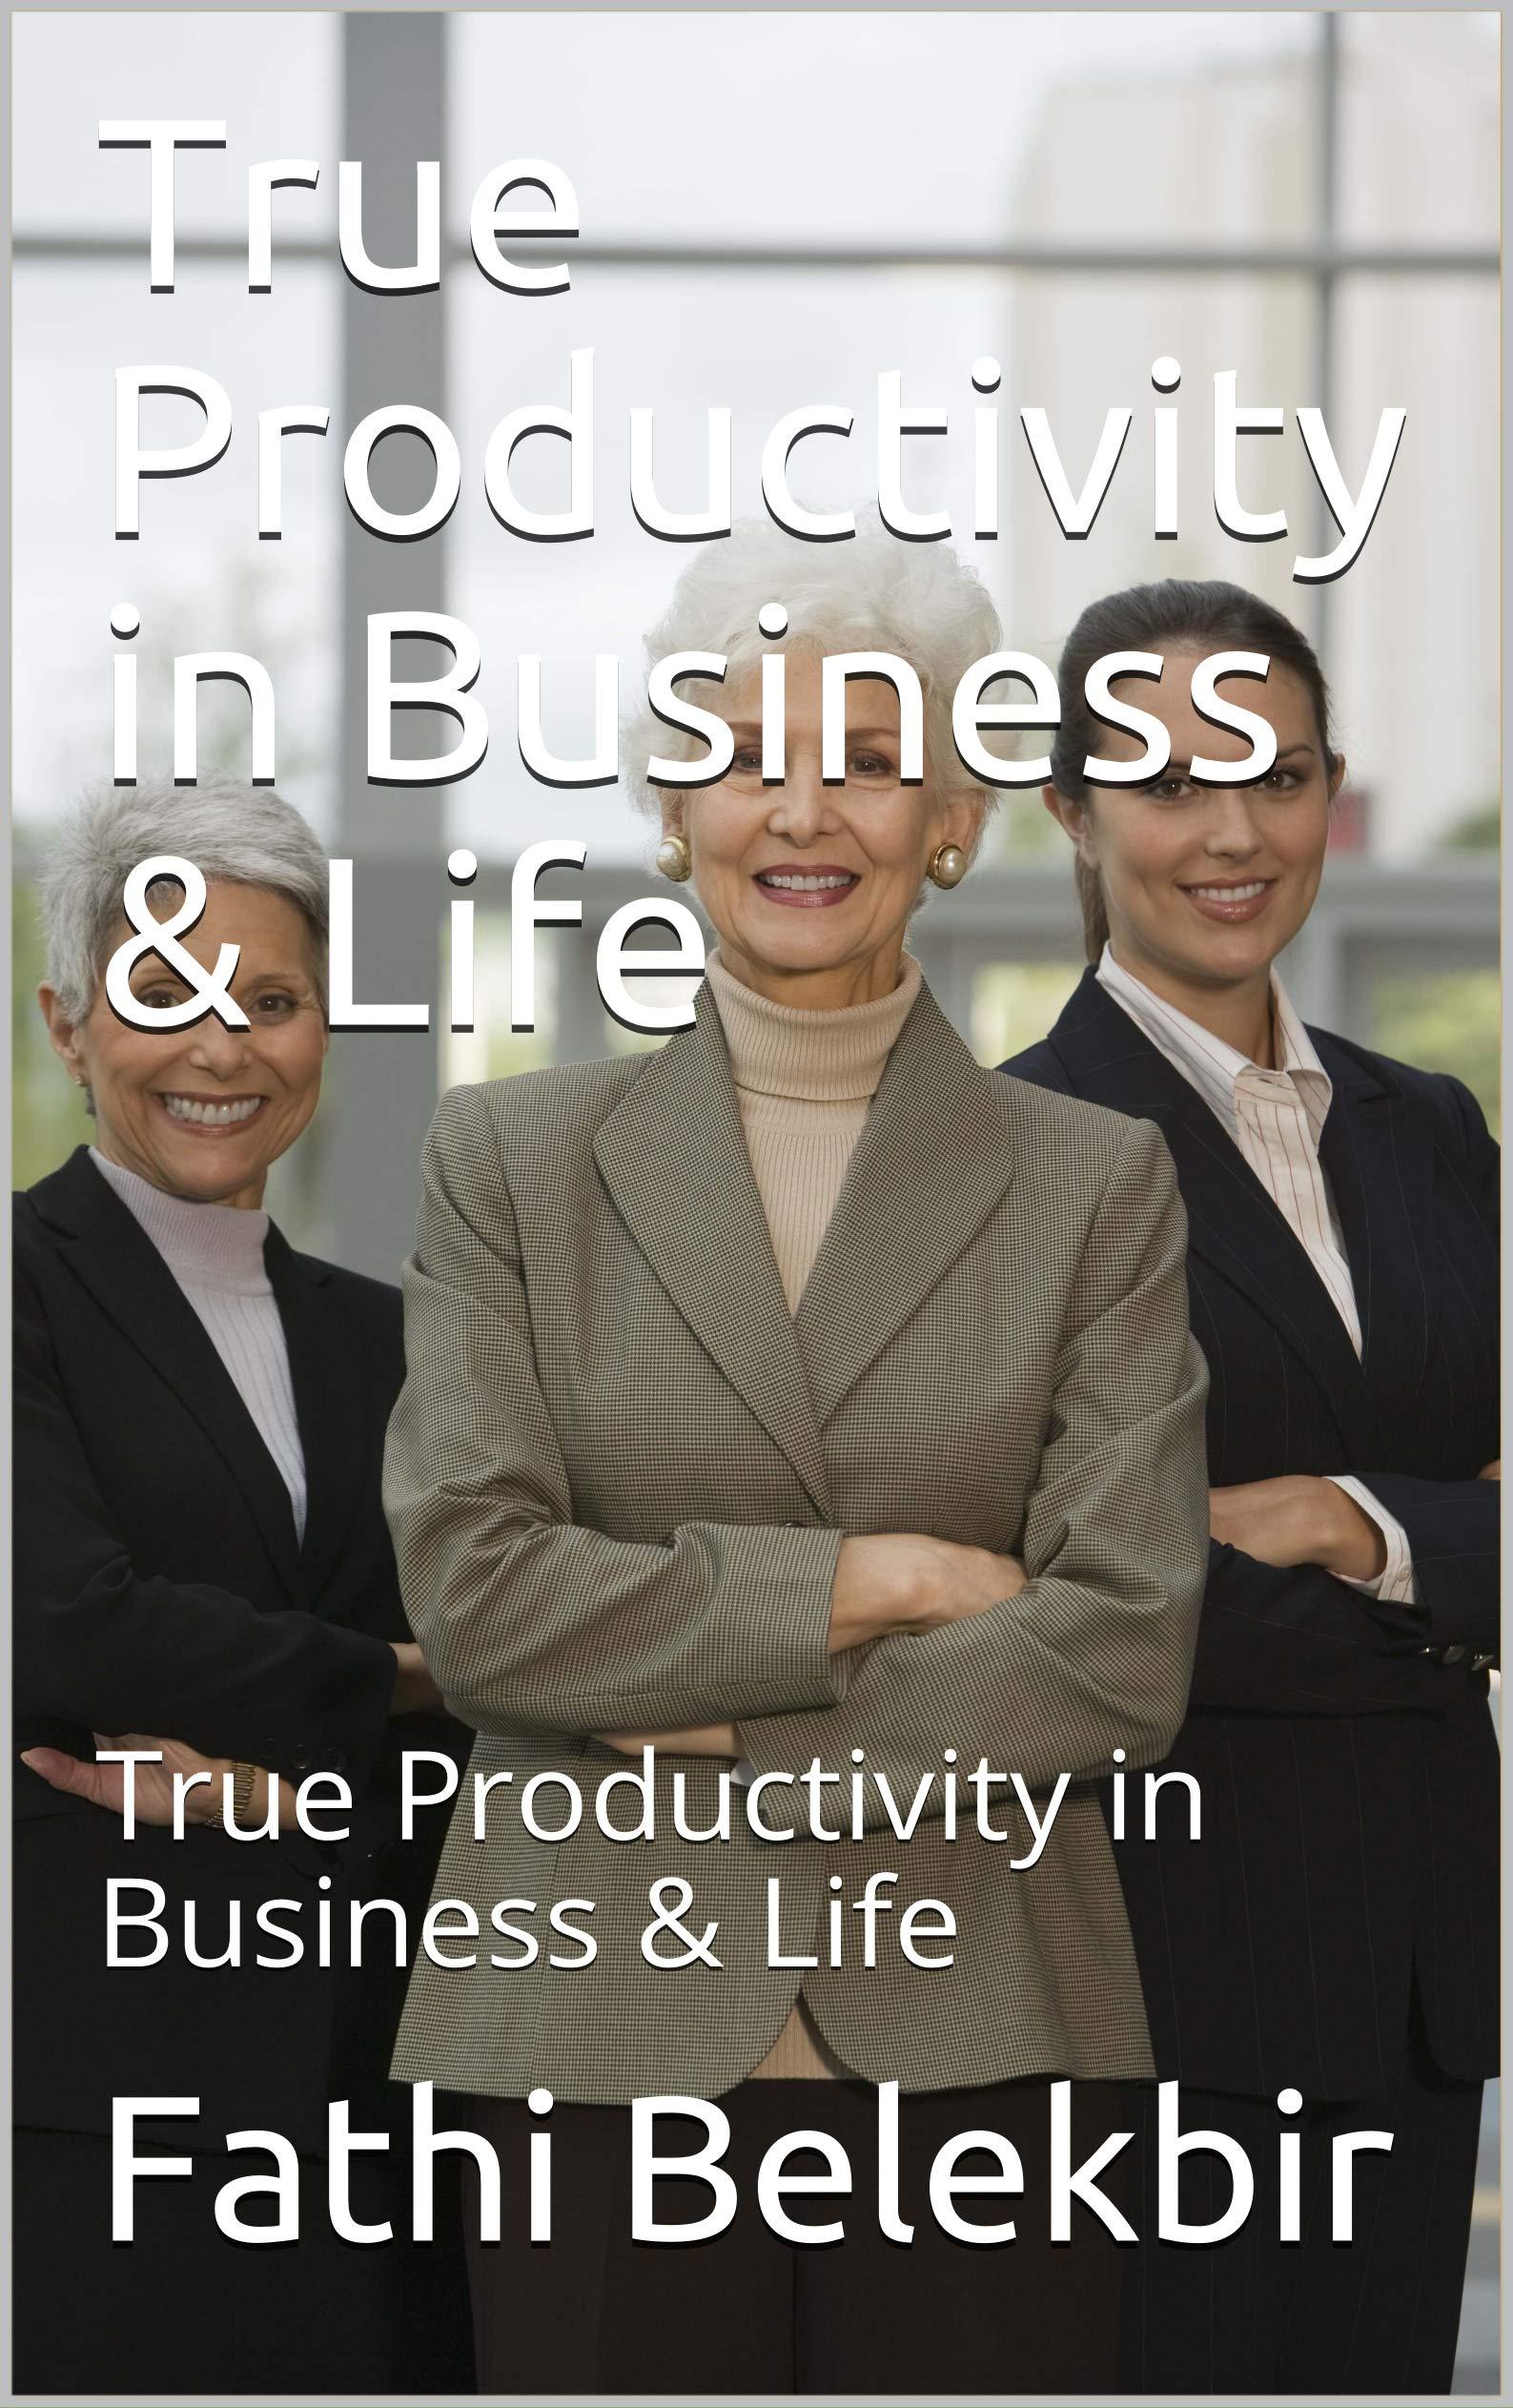 True Productivity in Business & Life: True Productivity in Business & Life